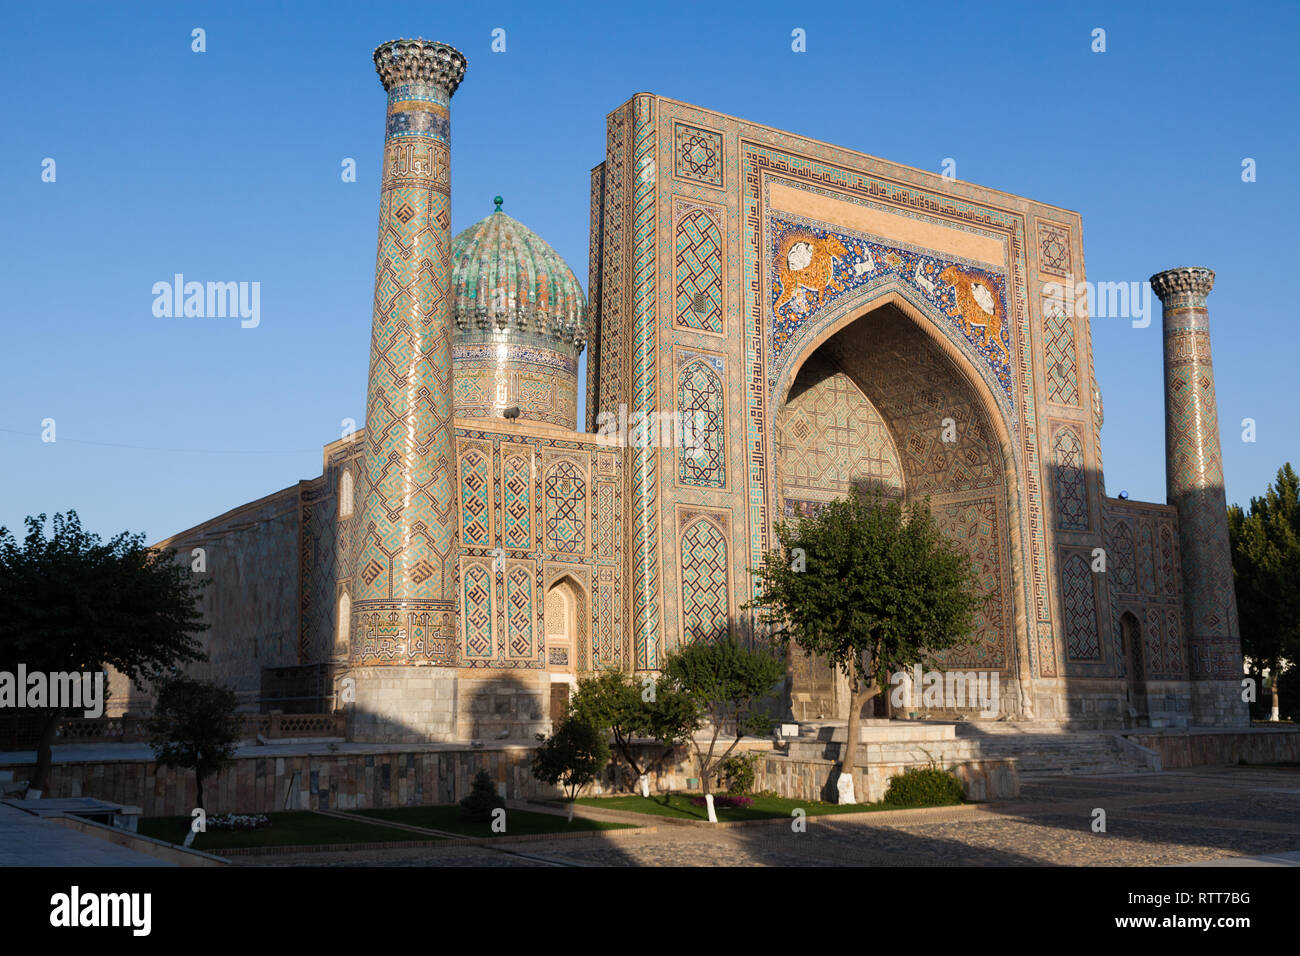 The Registan, the heart of the ancient city of Samarkand - Uzbekistan - Stock Image